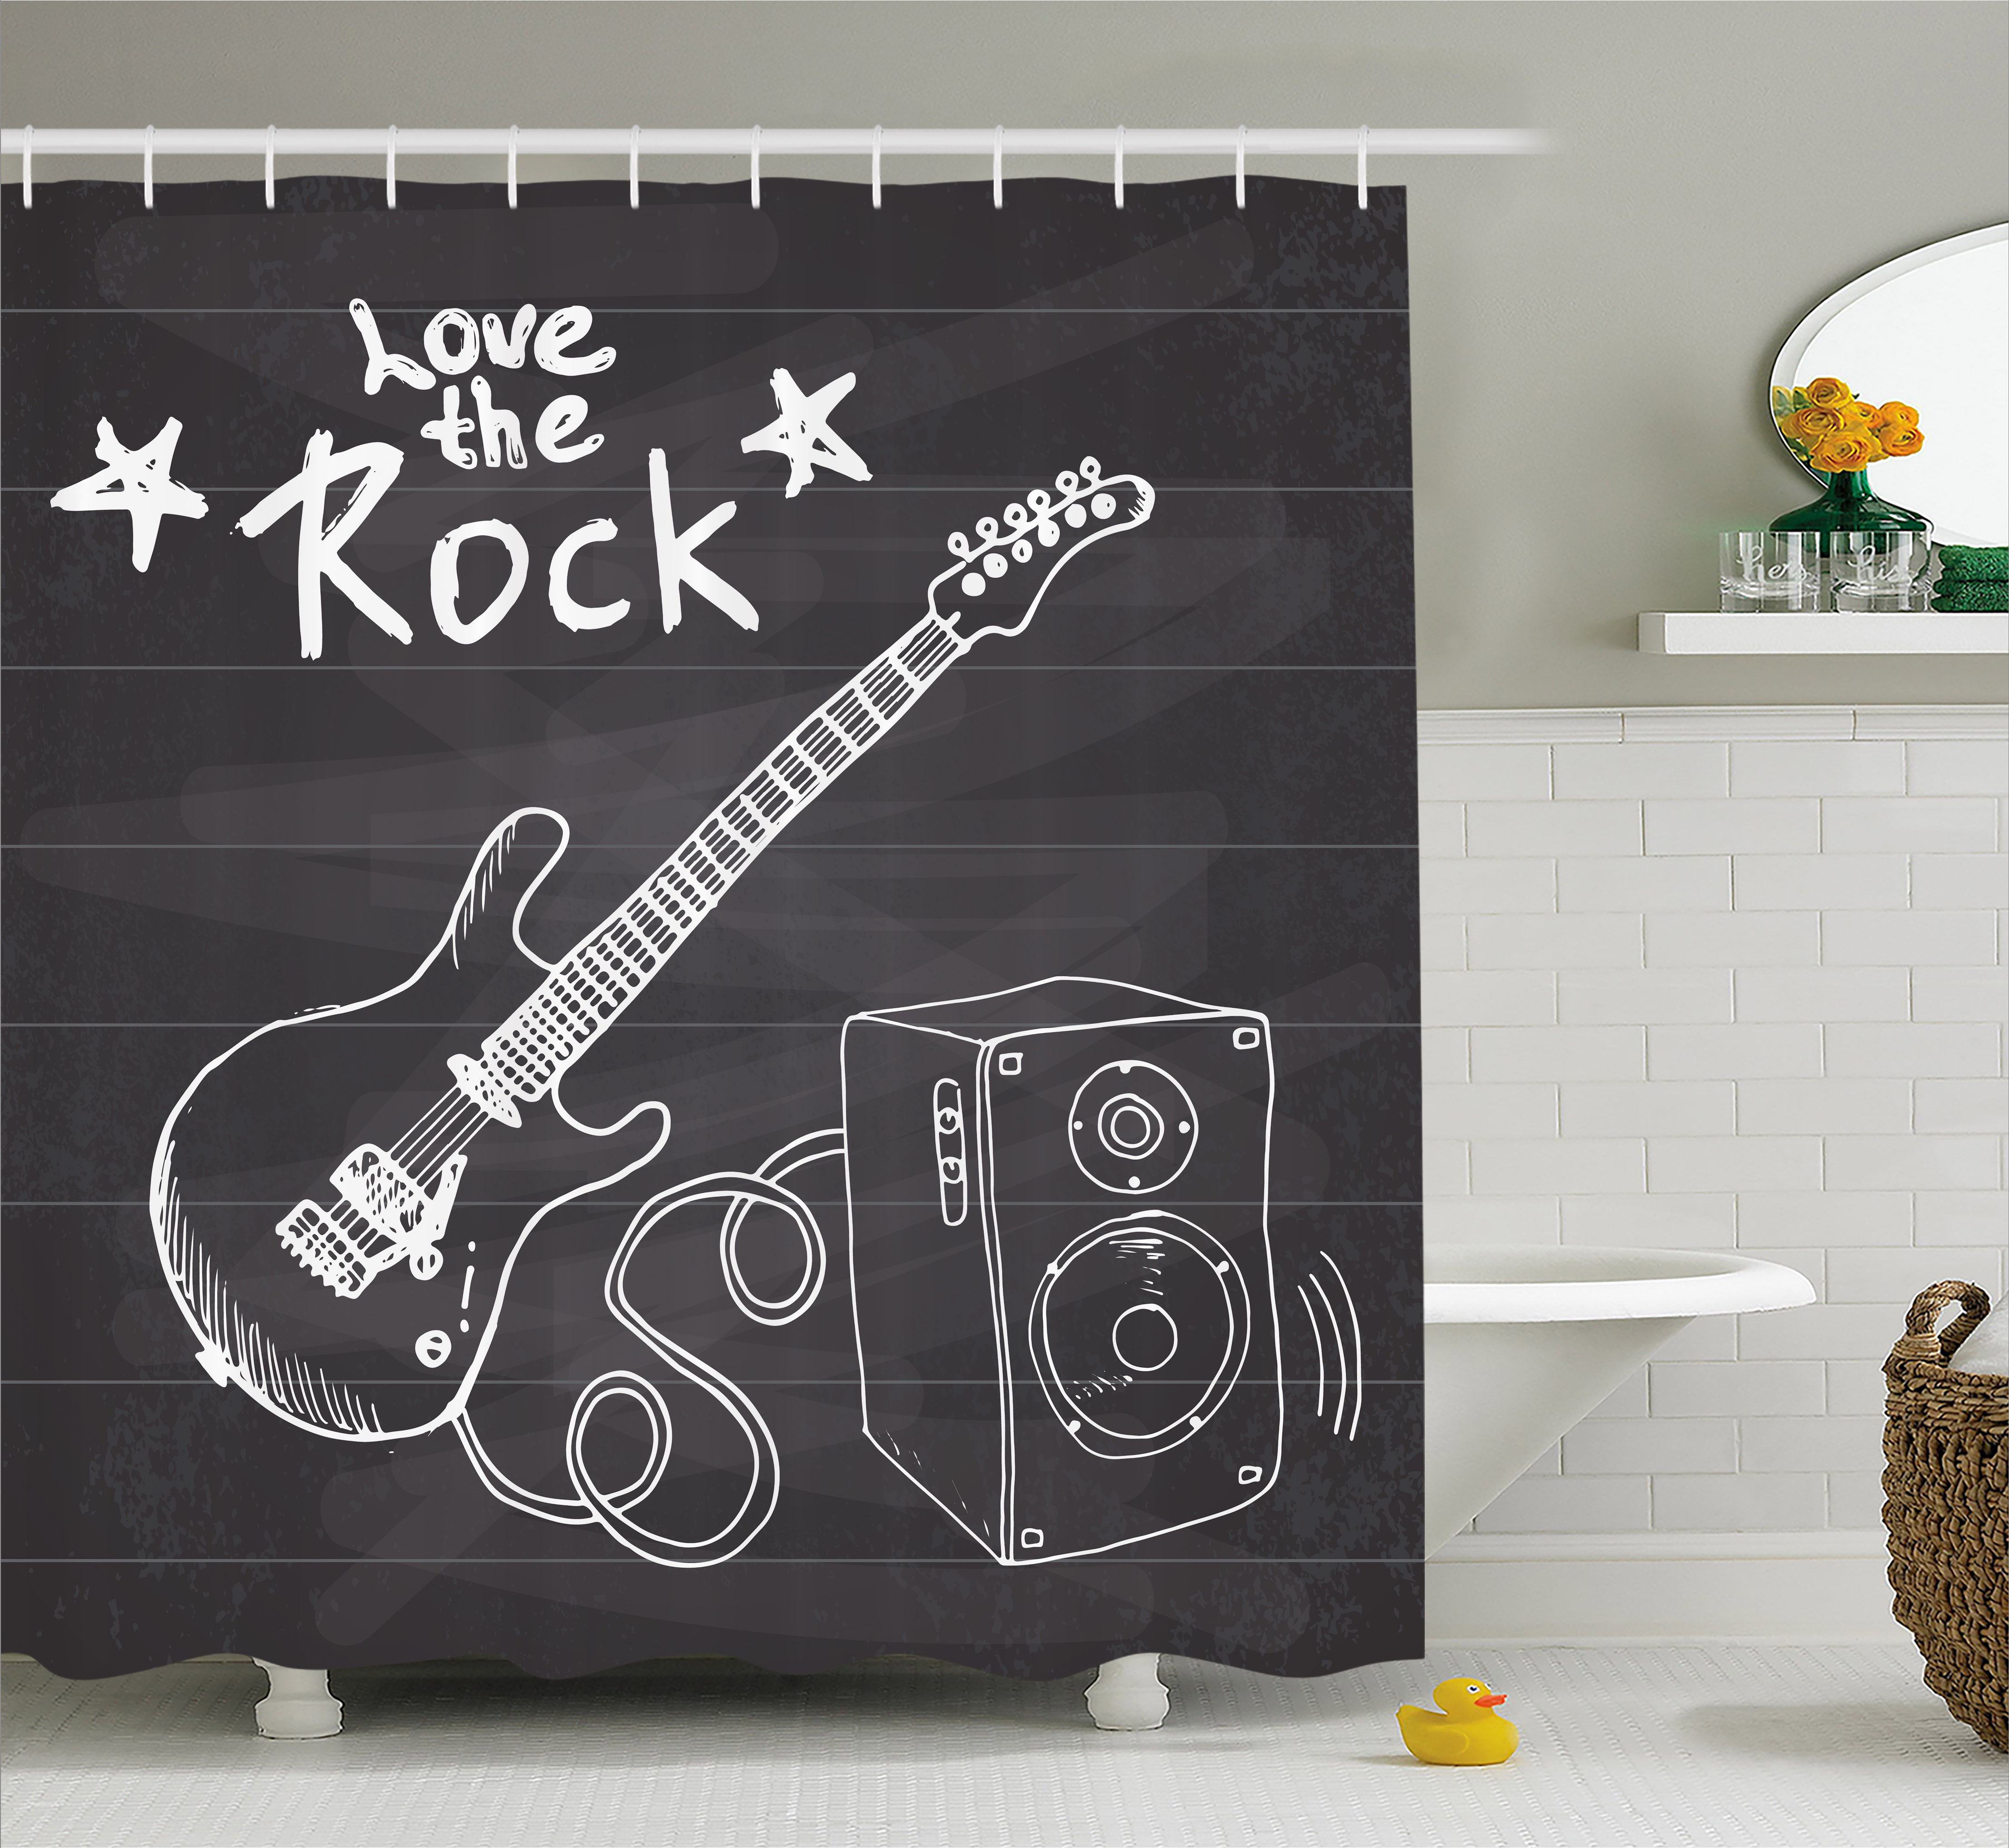 Guitar Shower Curtain Love The Rock Music Themed Sketch Art Sound